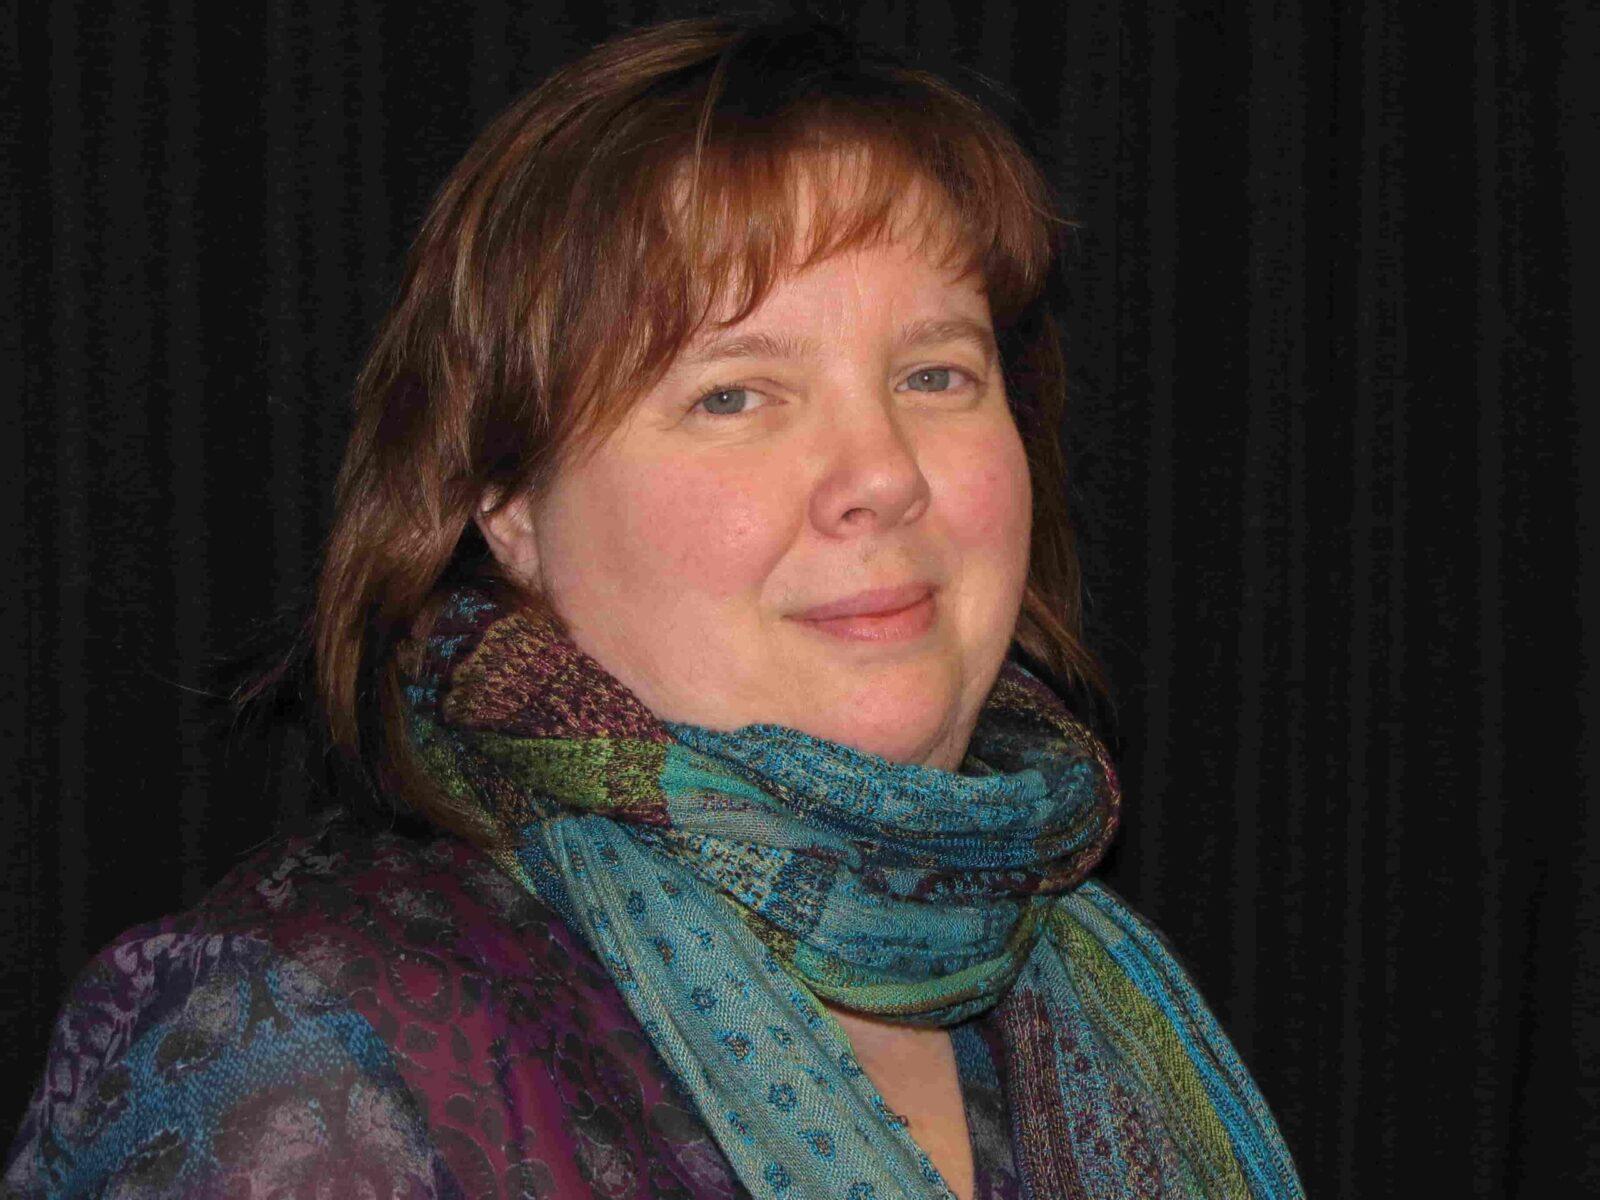 Helene Martineau - Travailleuse de milieu - Aînés vulnérables • Maltraitance • Rappid+OR